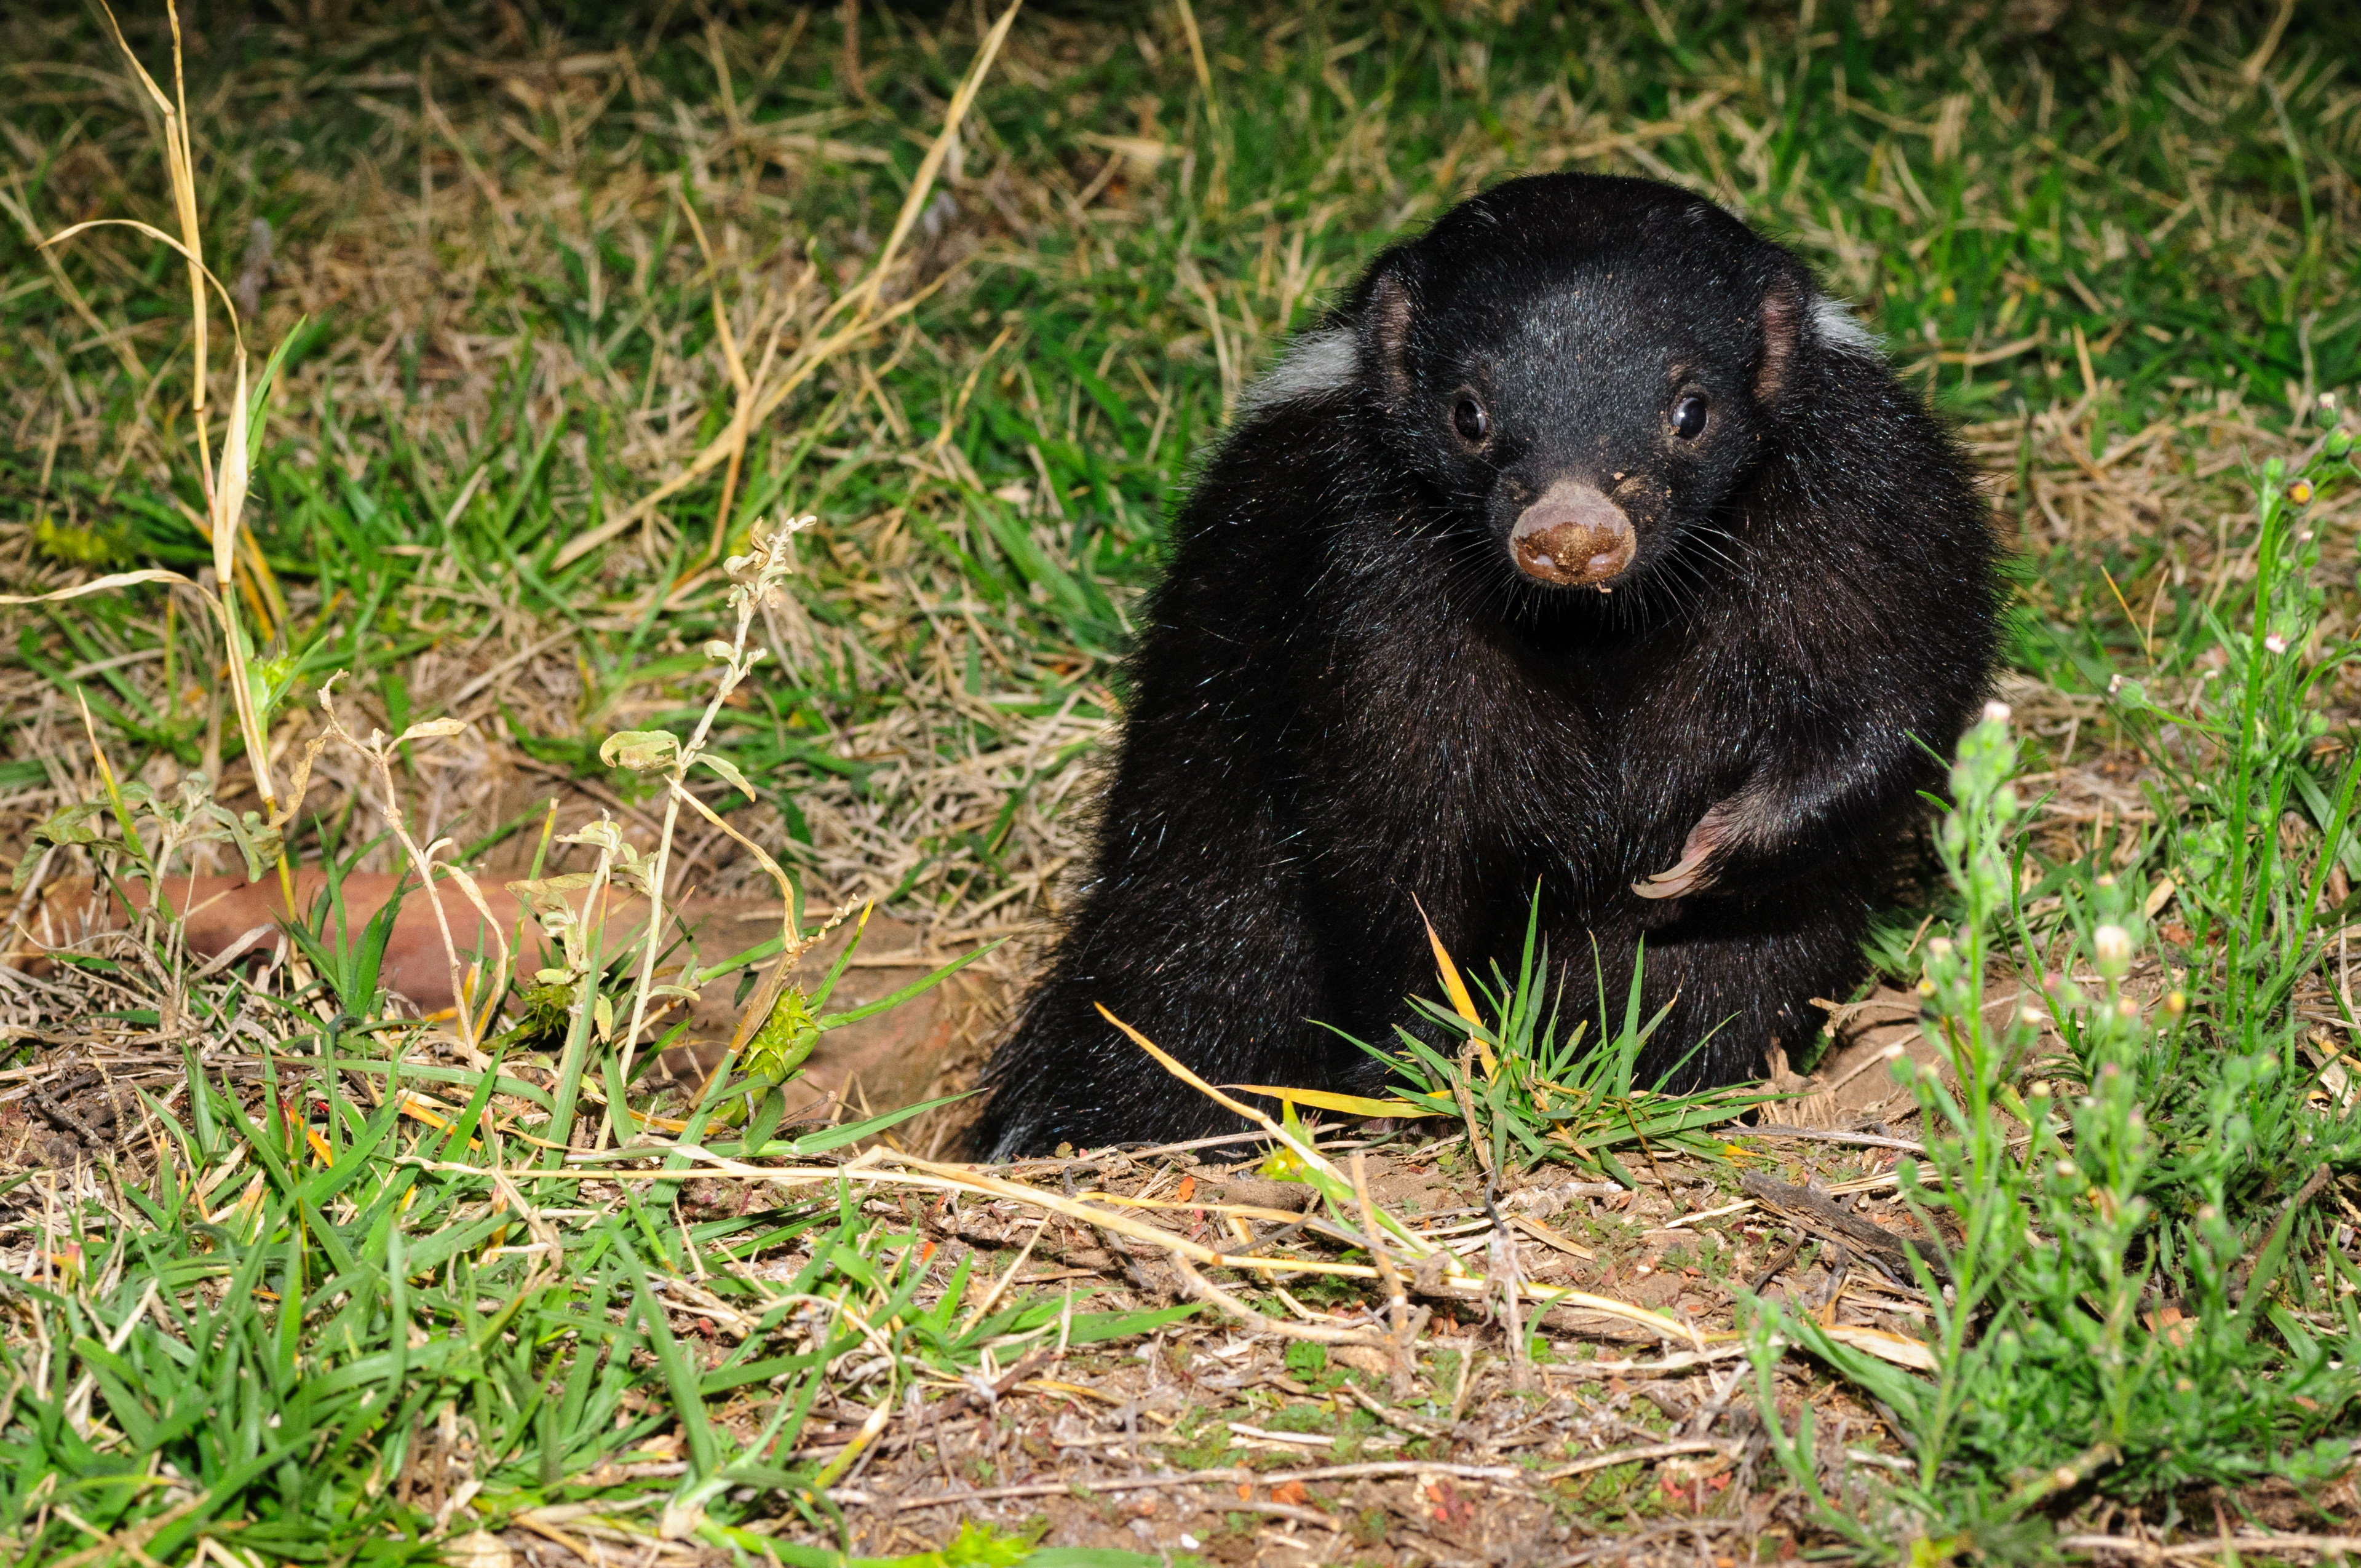 Patagonian Hog-nosed Skunk leaving his burrow.